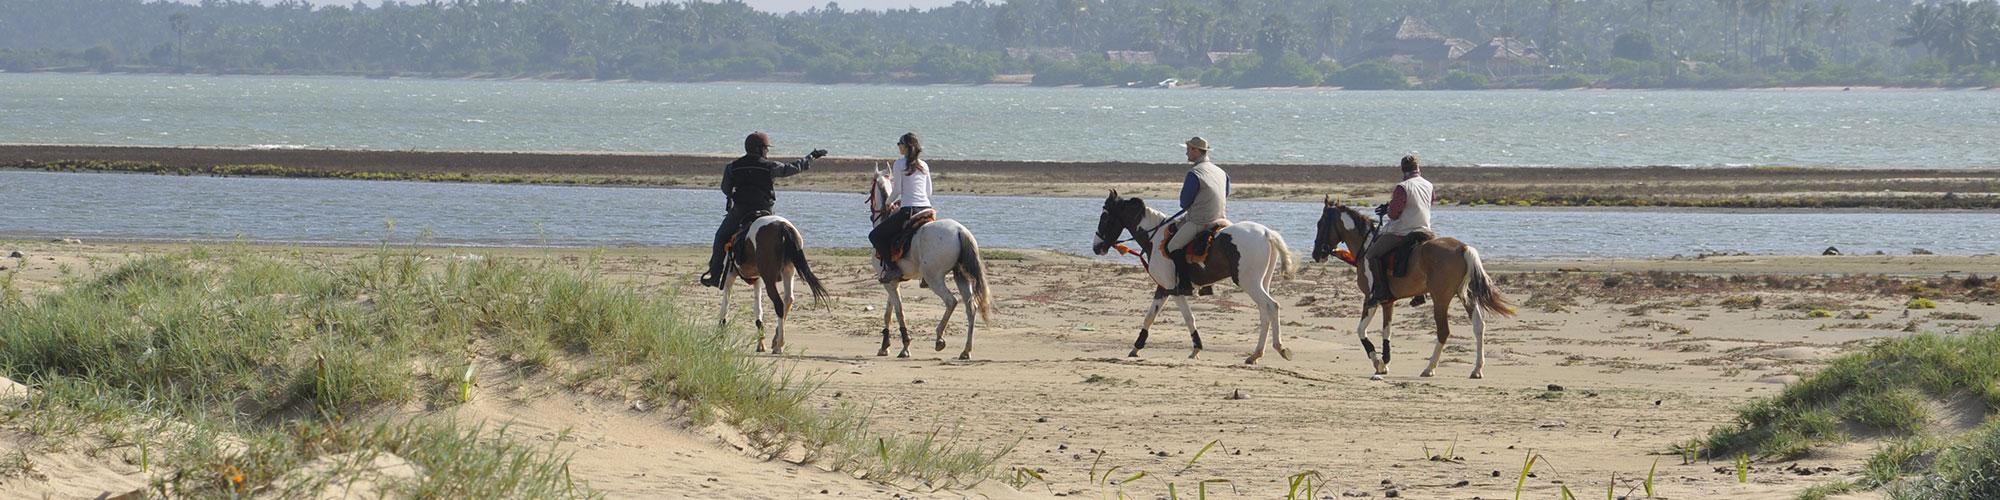 Horseback riding on the beach